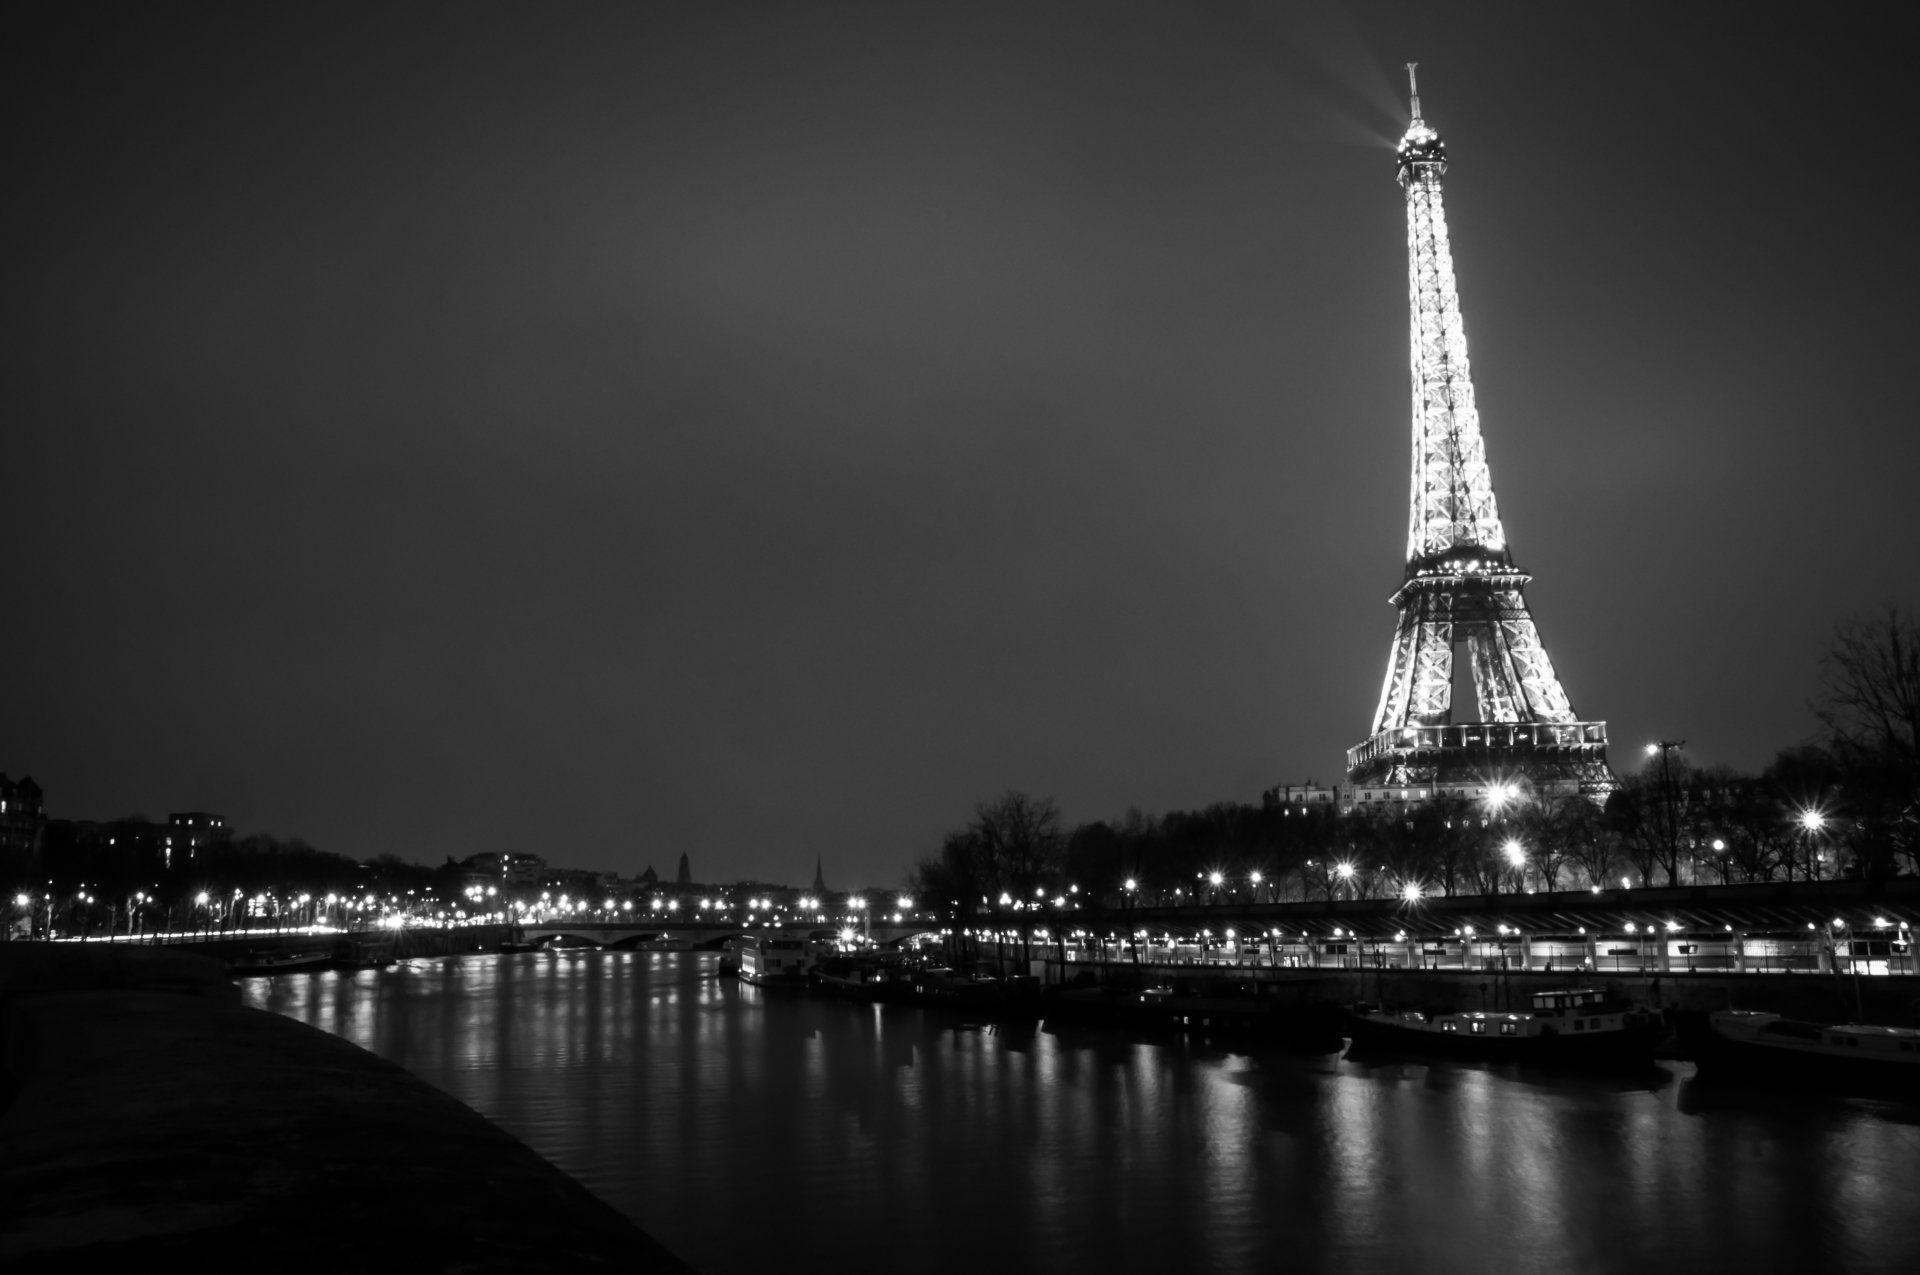 Wow Unique Black And White Skyline Photo Blackandwhiteskylinephoto Black And White City City Wallpaper Paris Black And White